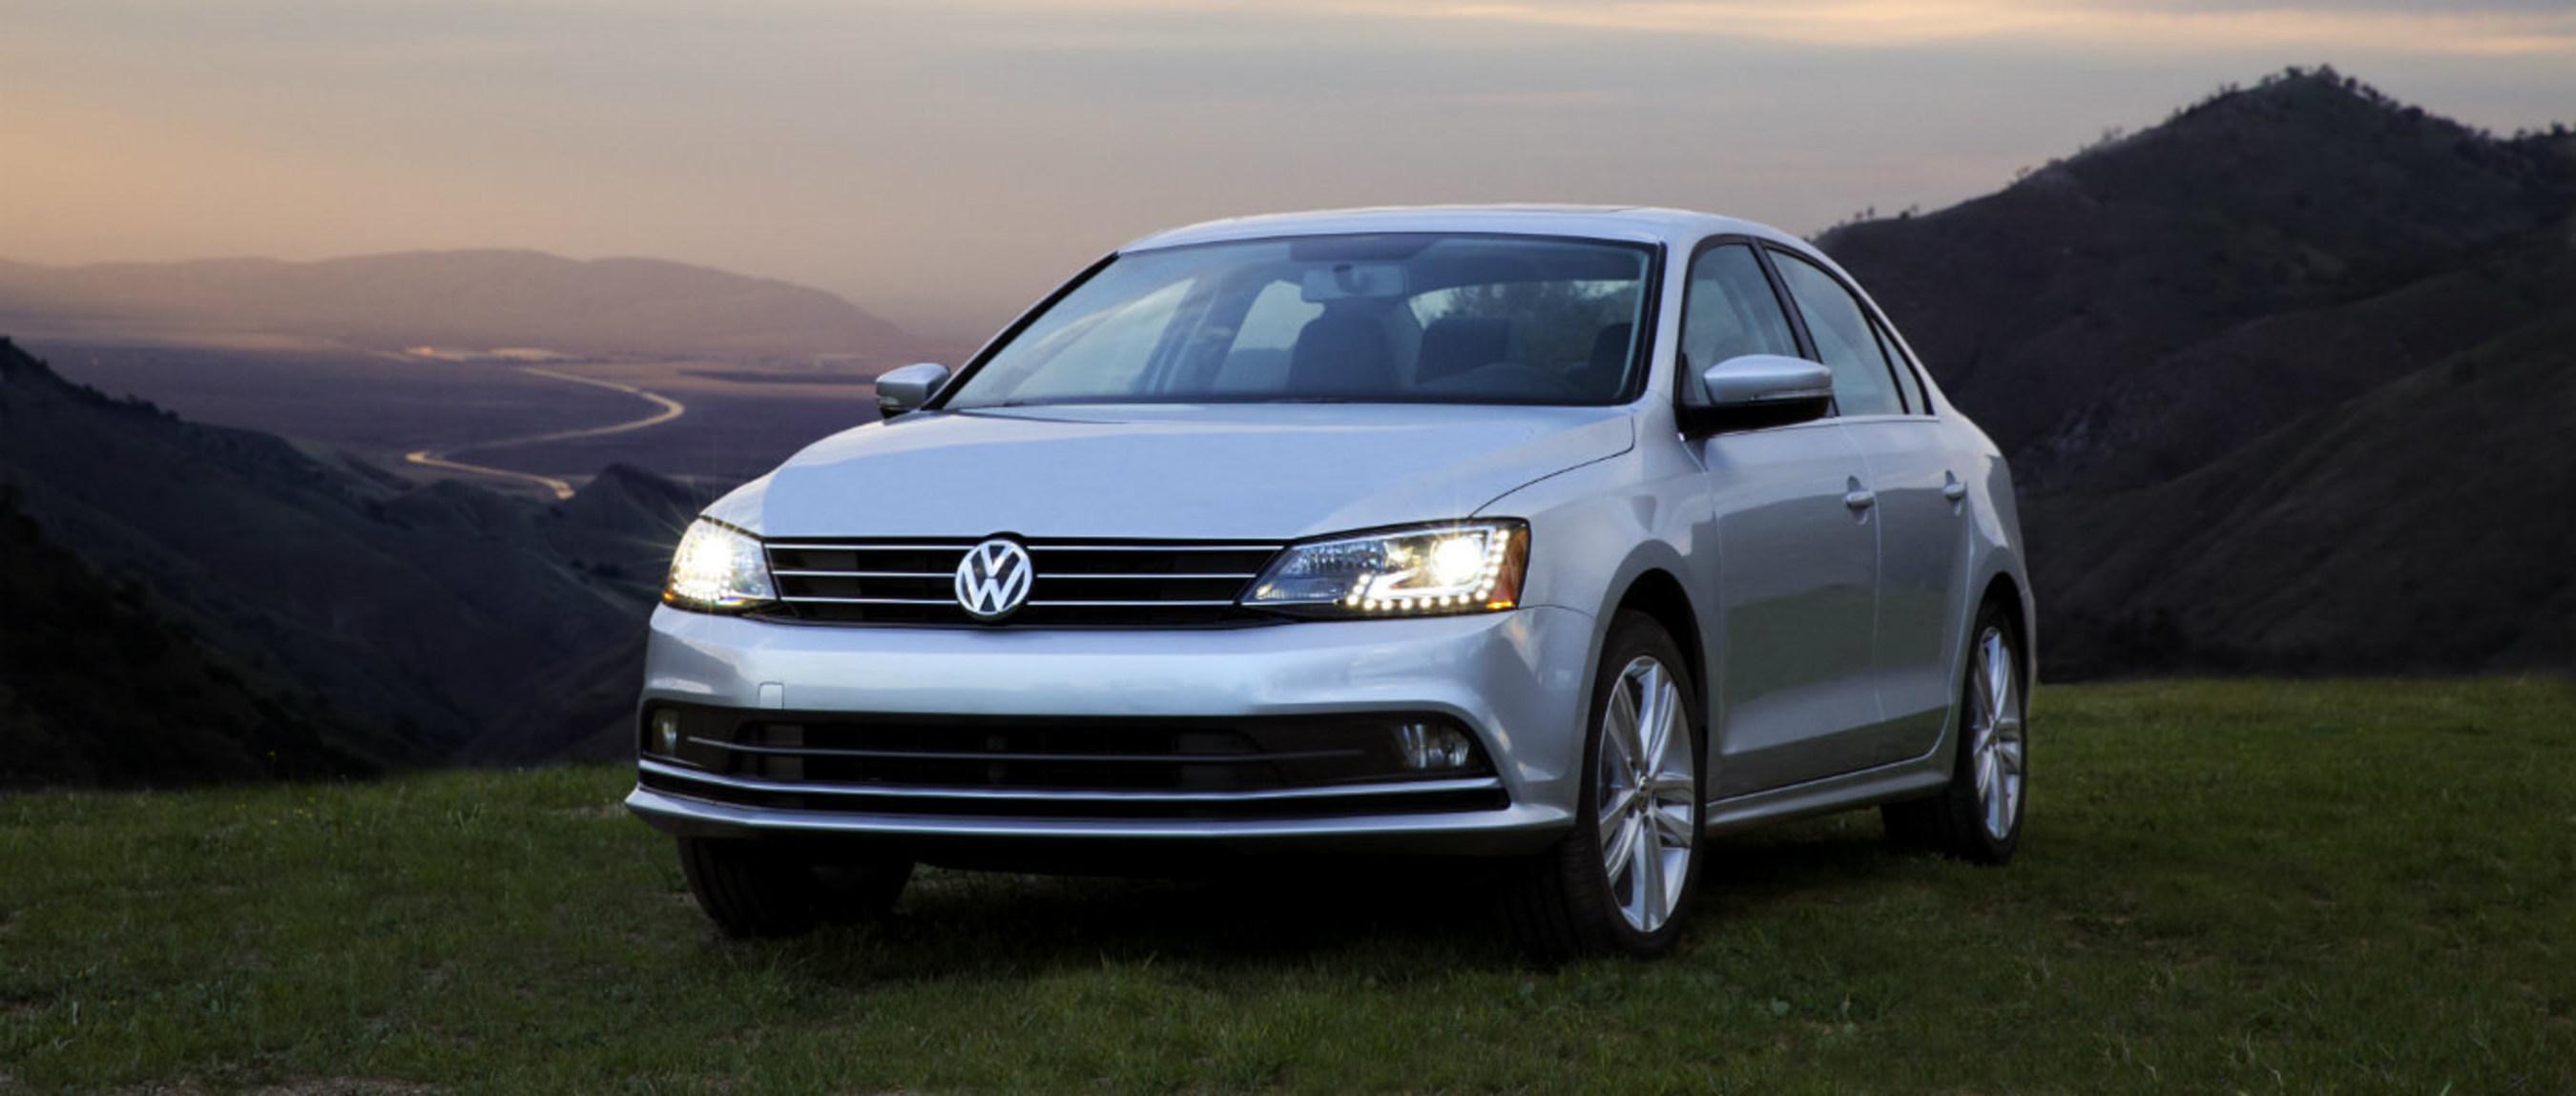 Woodland Hills, California dealership highlights benefits of 2015 Volkswagen Jetta